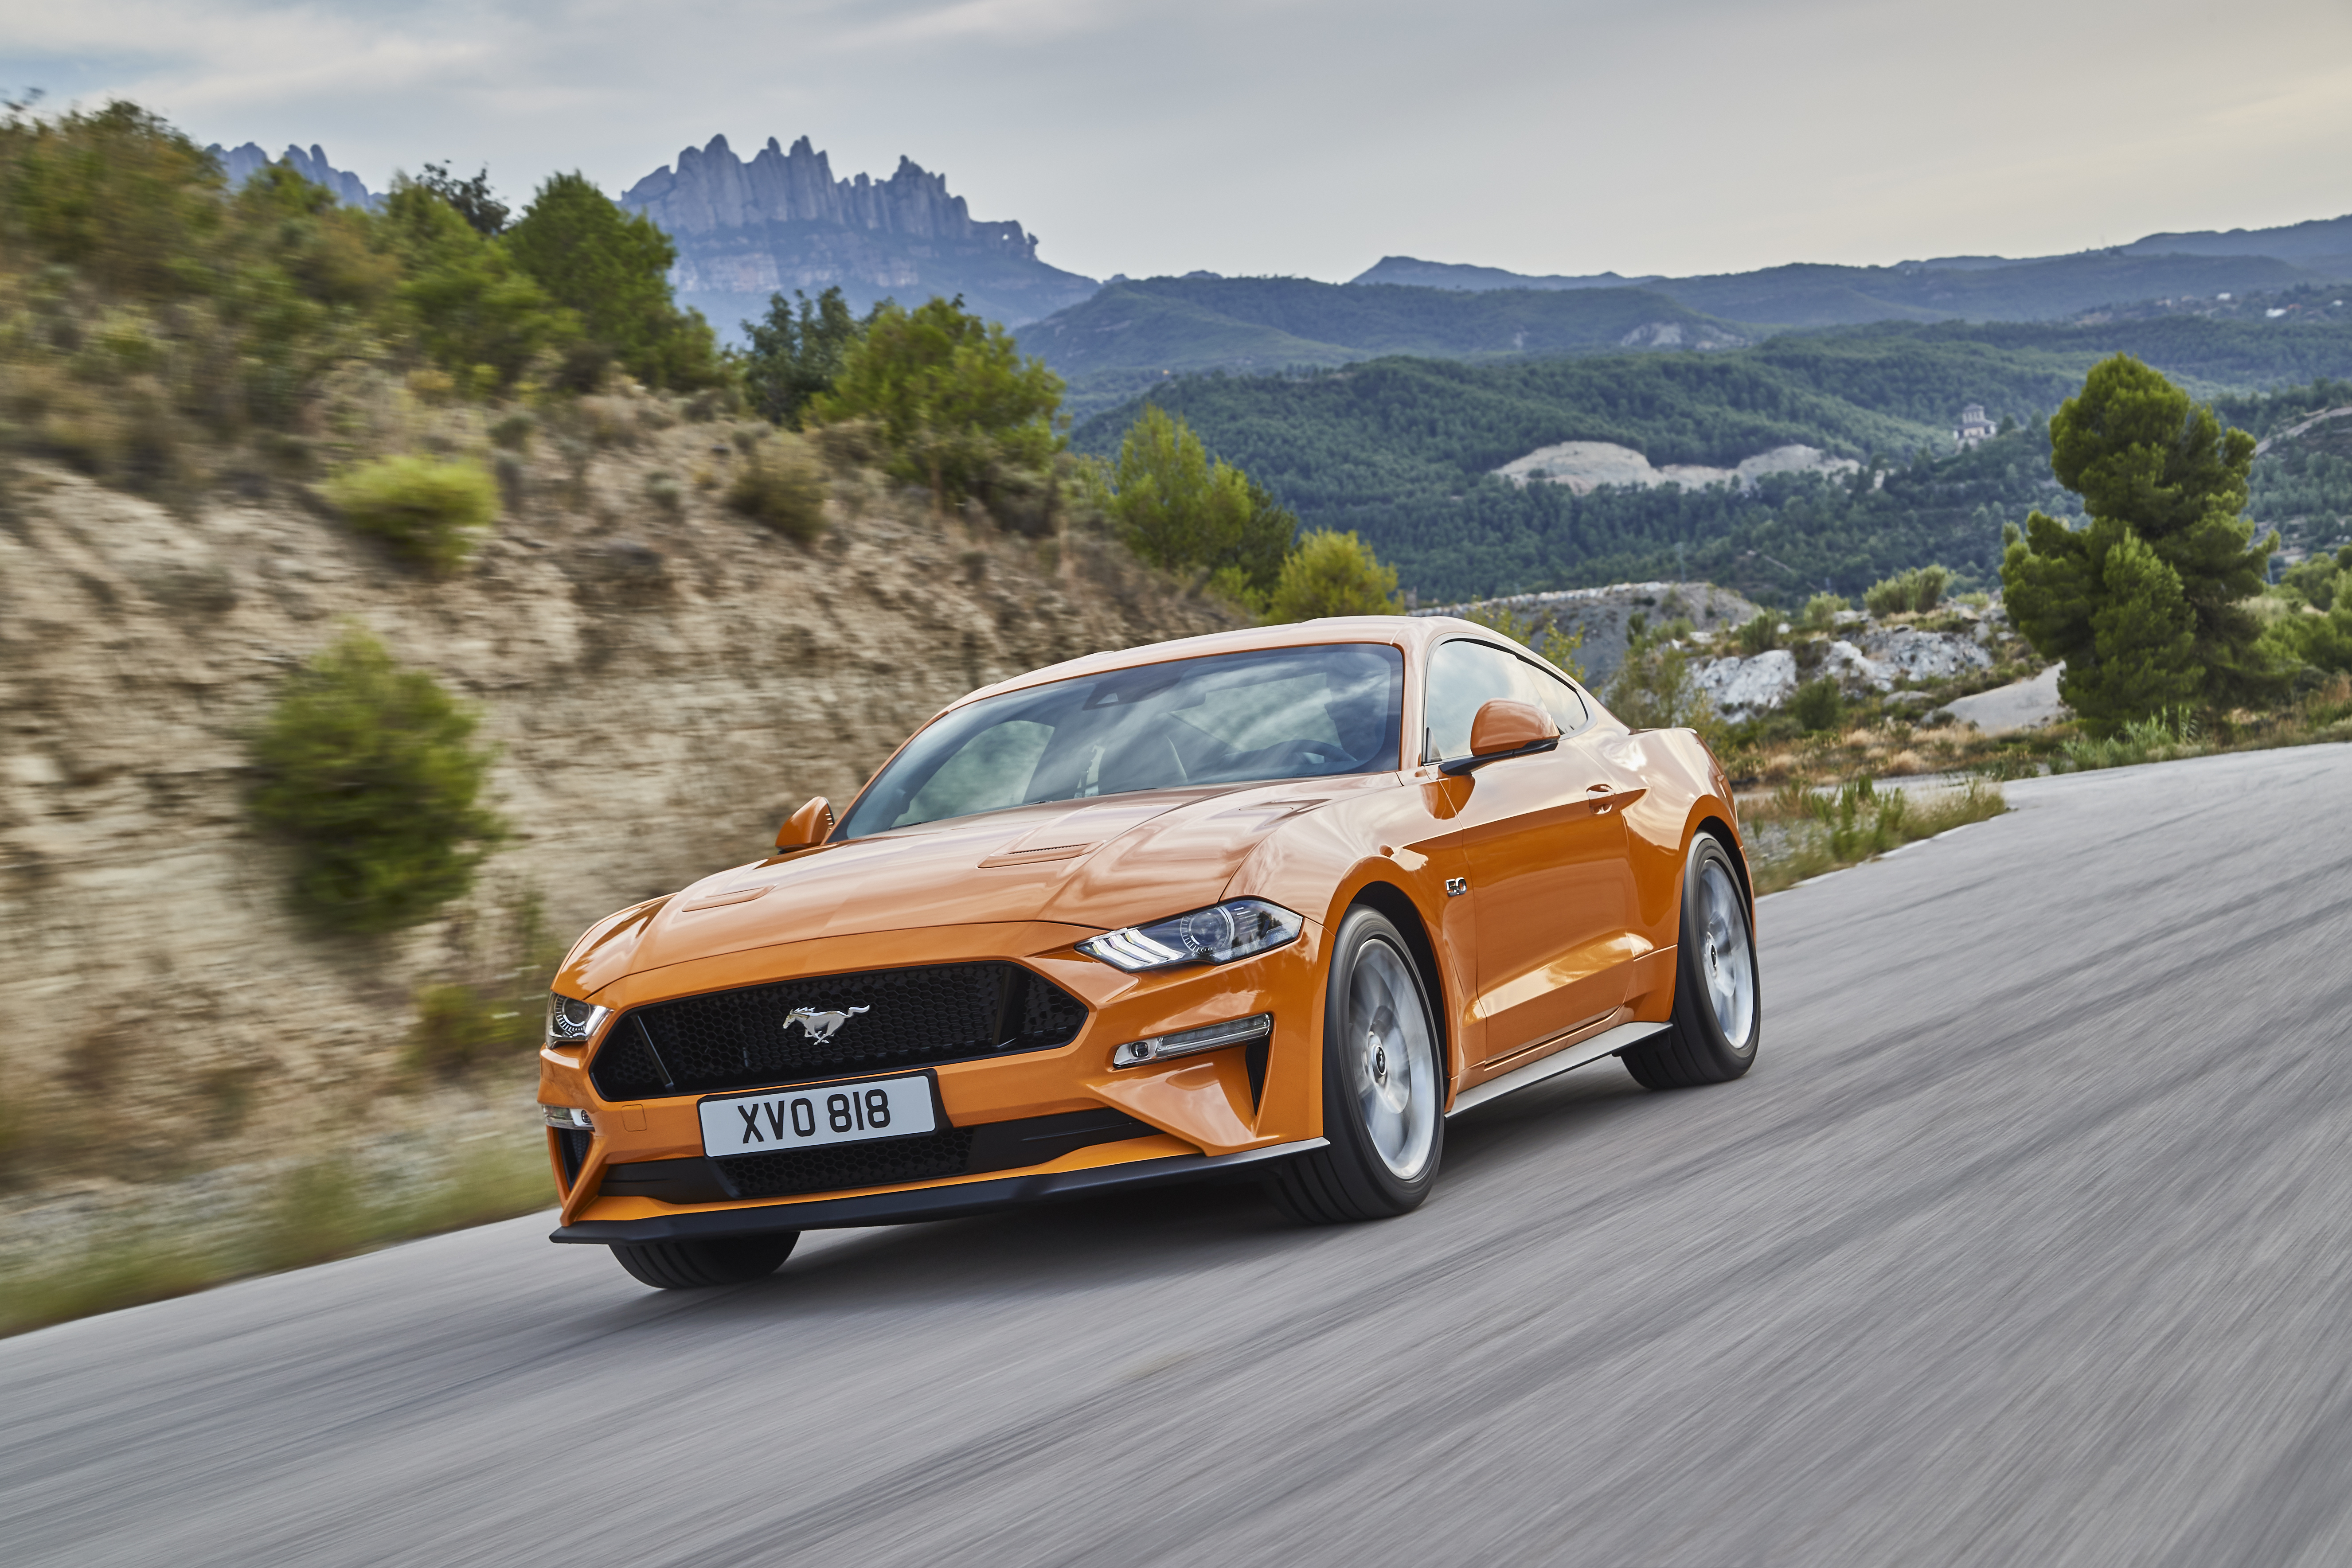 Ford Mustang Precos Impostos E Especificacoes Tecnicas Motores